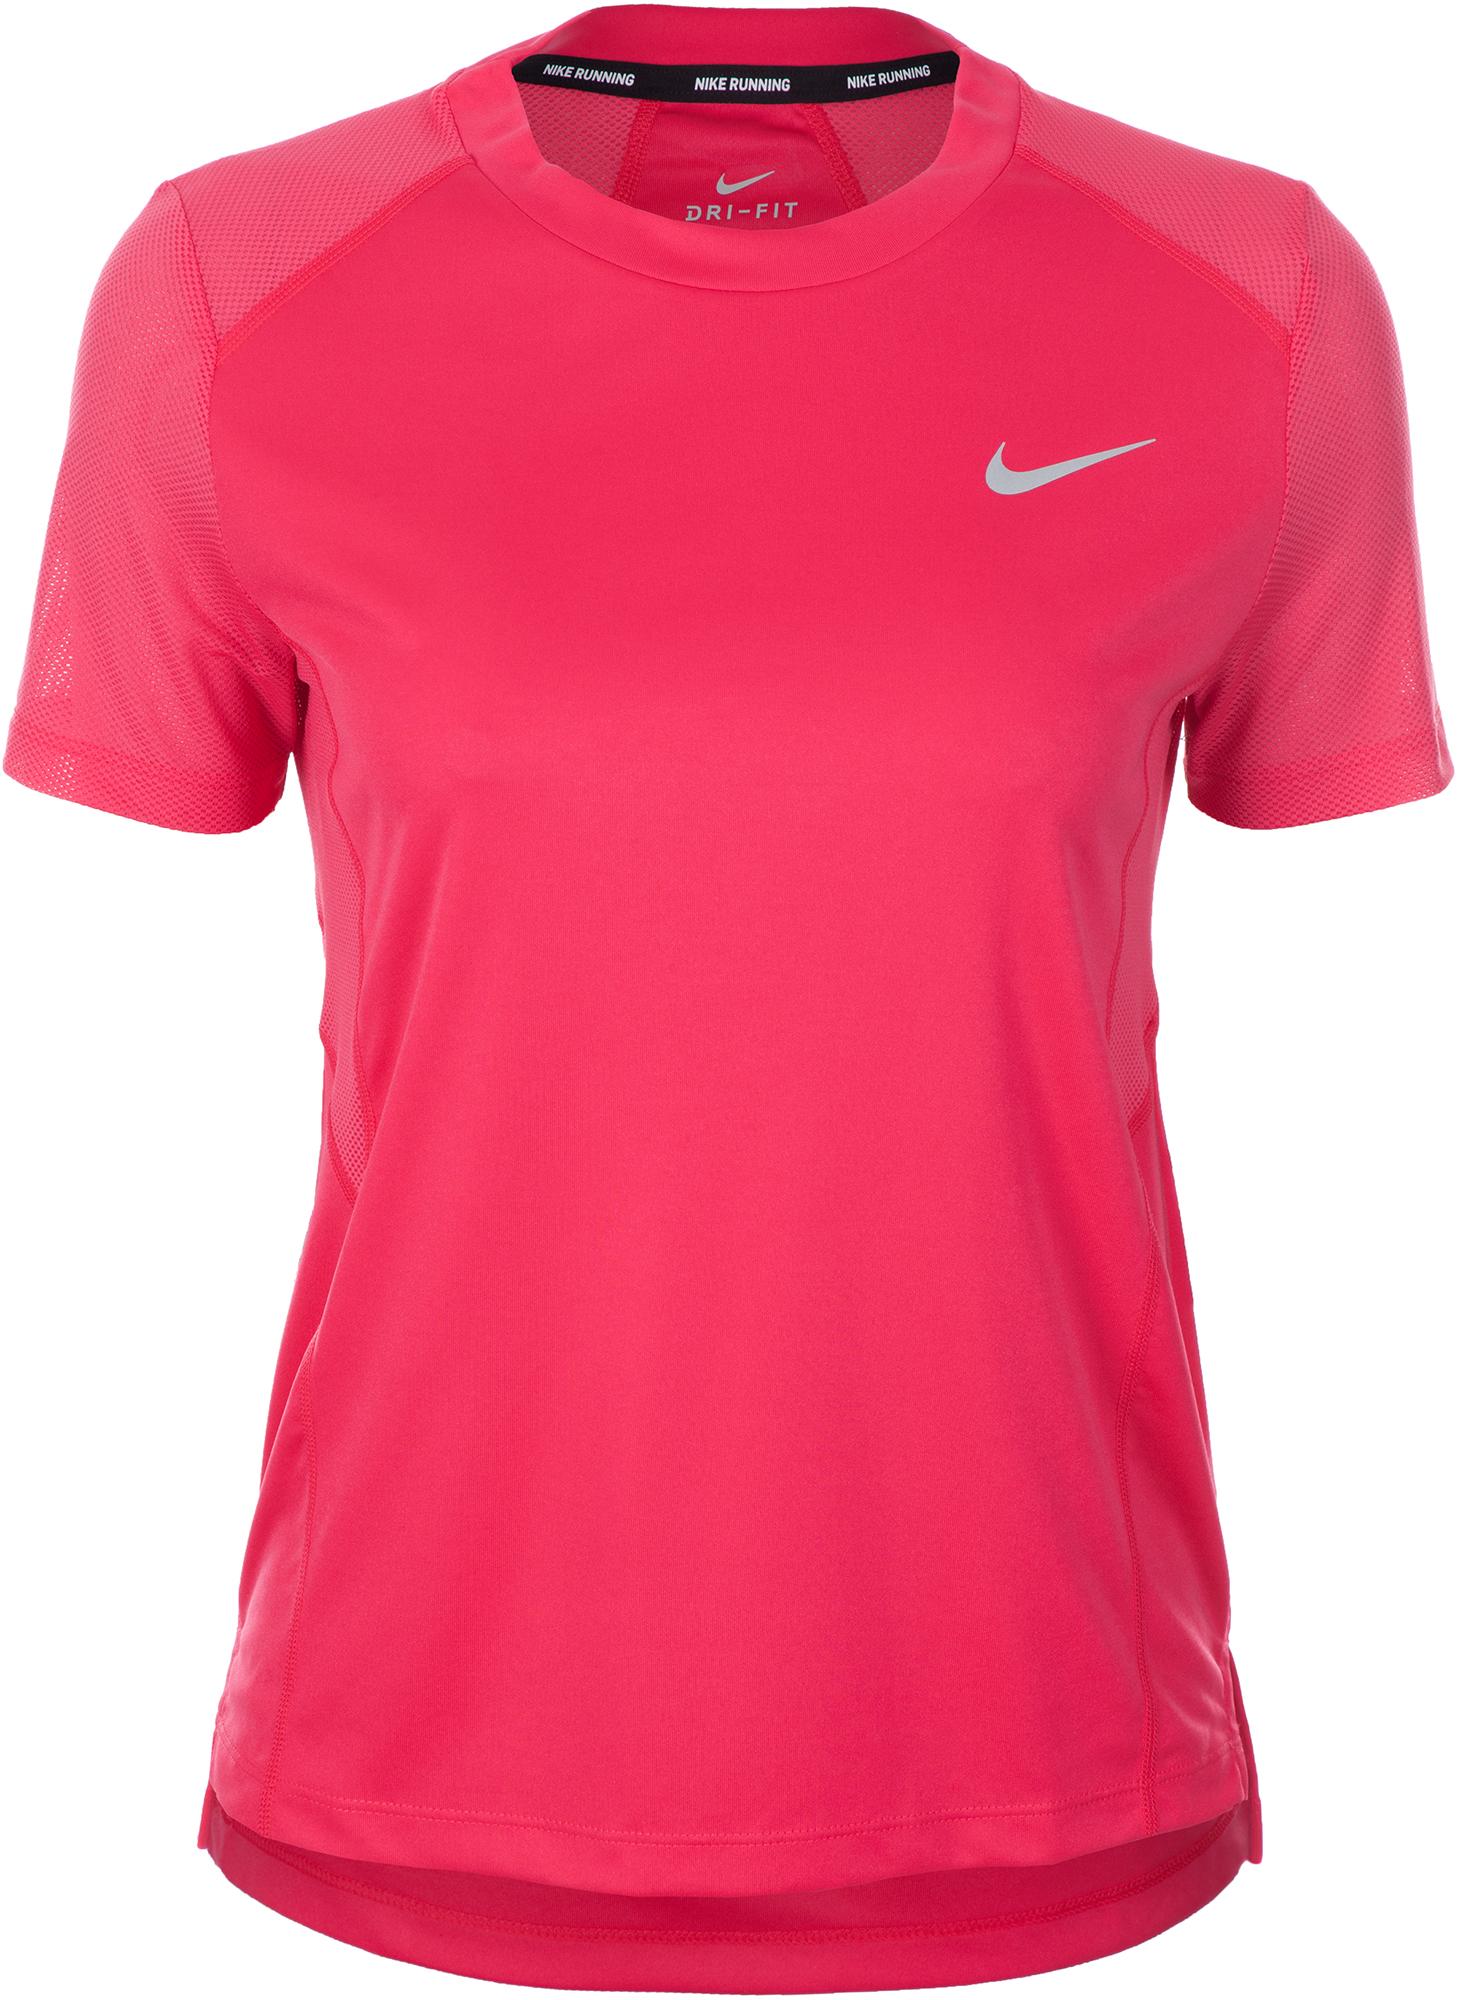 Nike Футболка женская Nike Miler, размер 48-50 футболка женская nike pro top цвет белый 889540 100 размер s 42 44